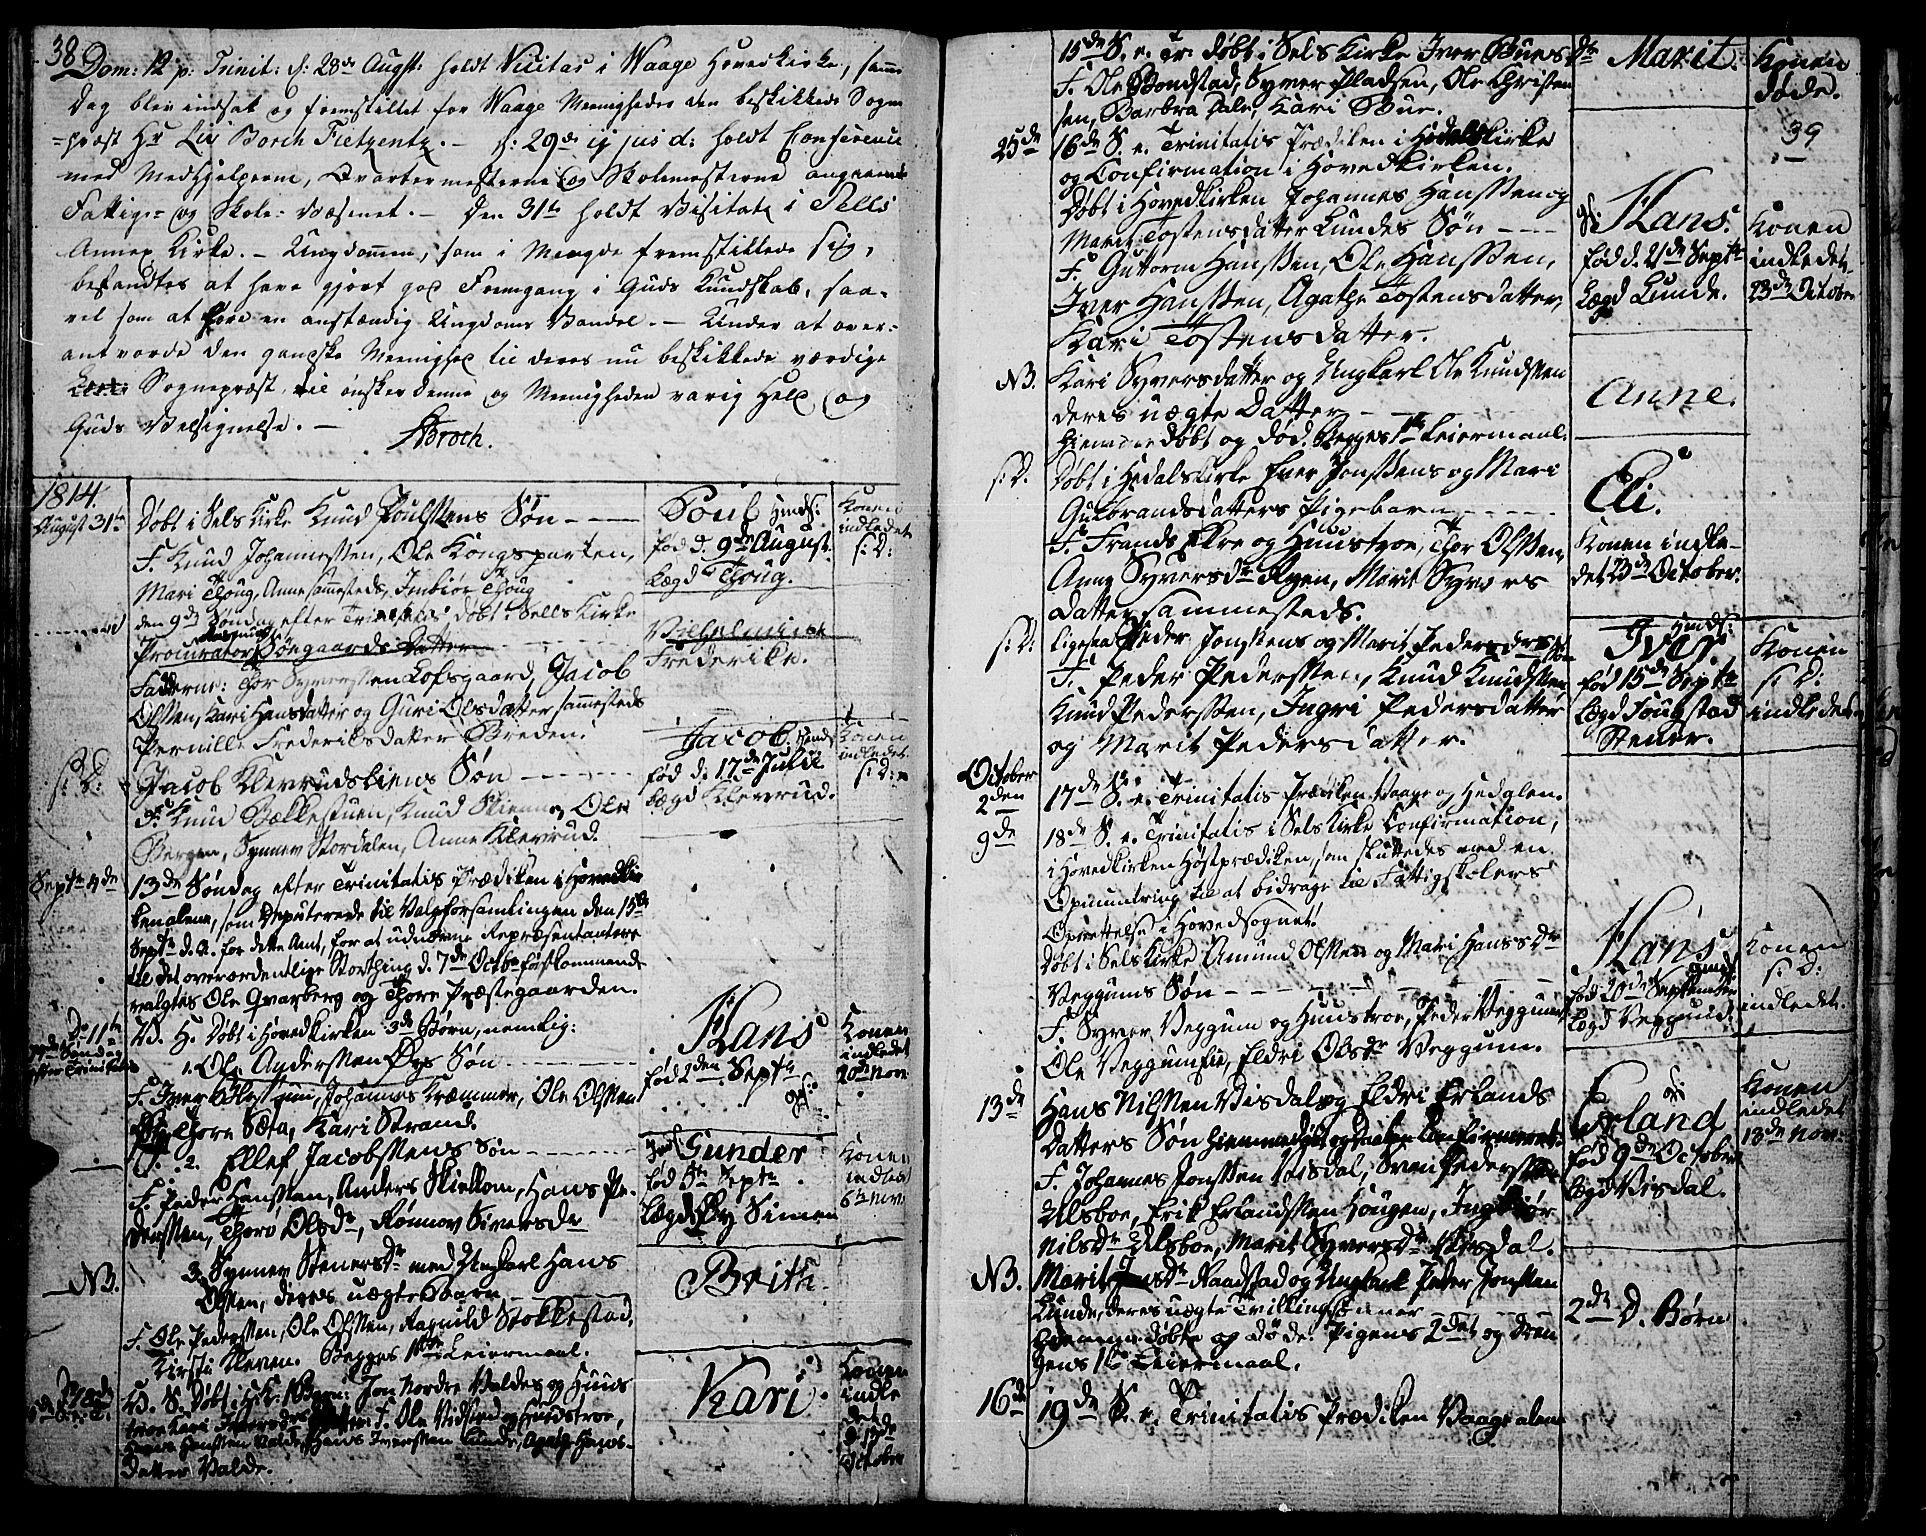 SAH, Vågå prestekontor, Ministerialbok nr. 2, 1810-1815, s. 38-39